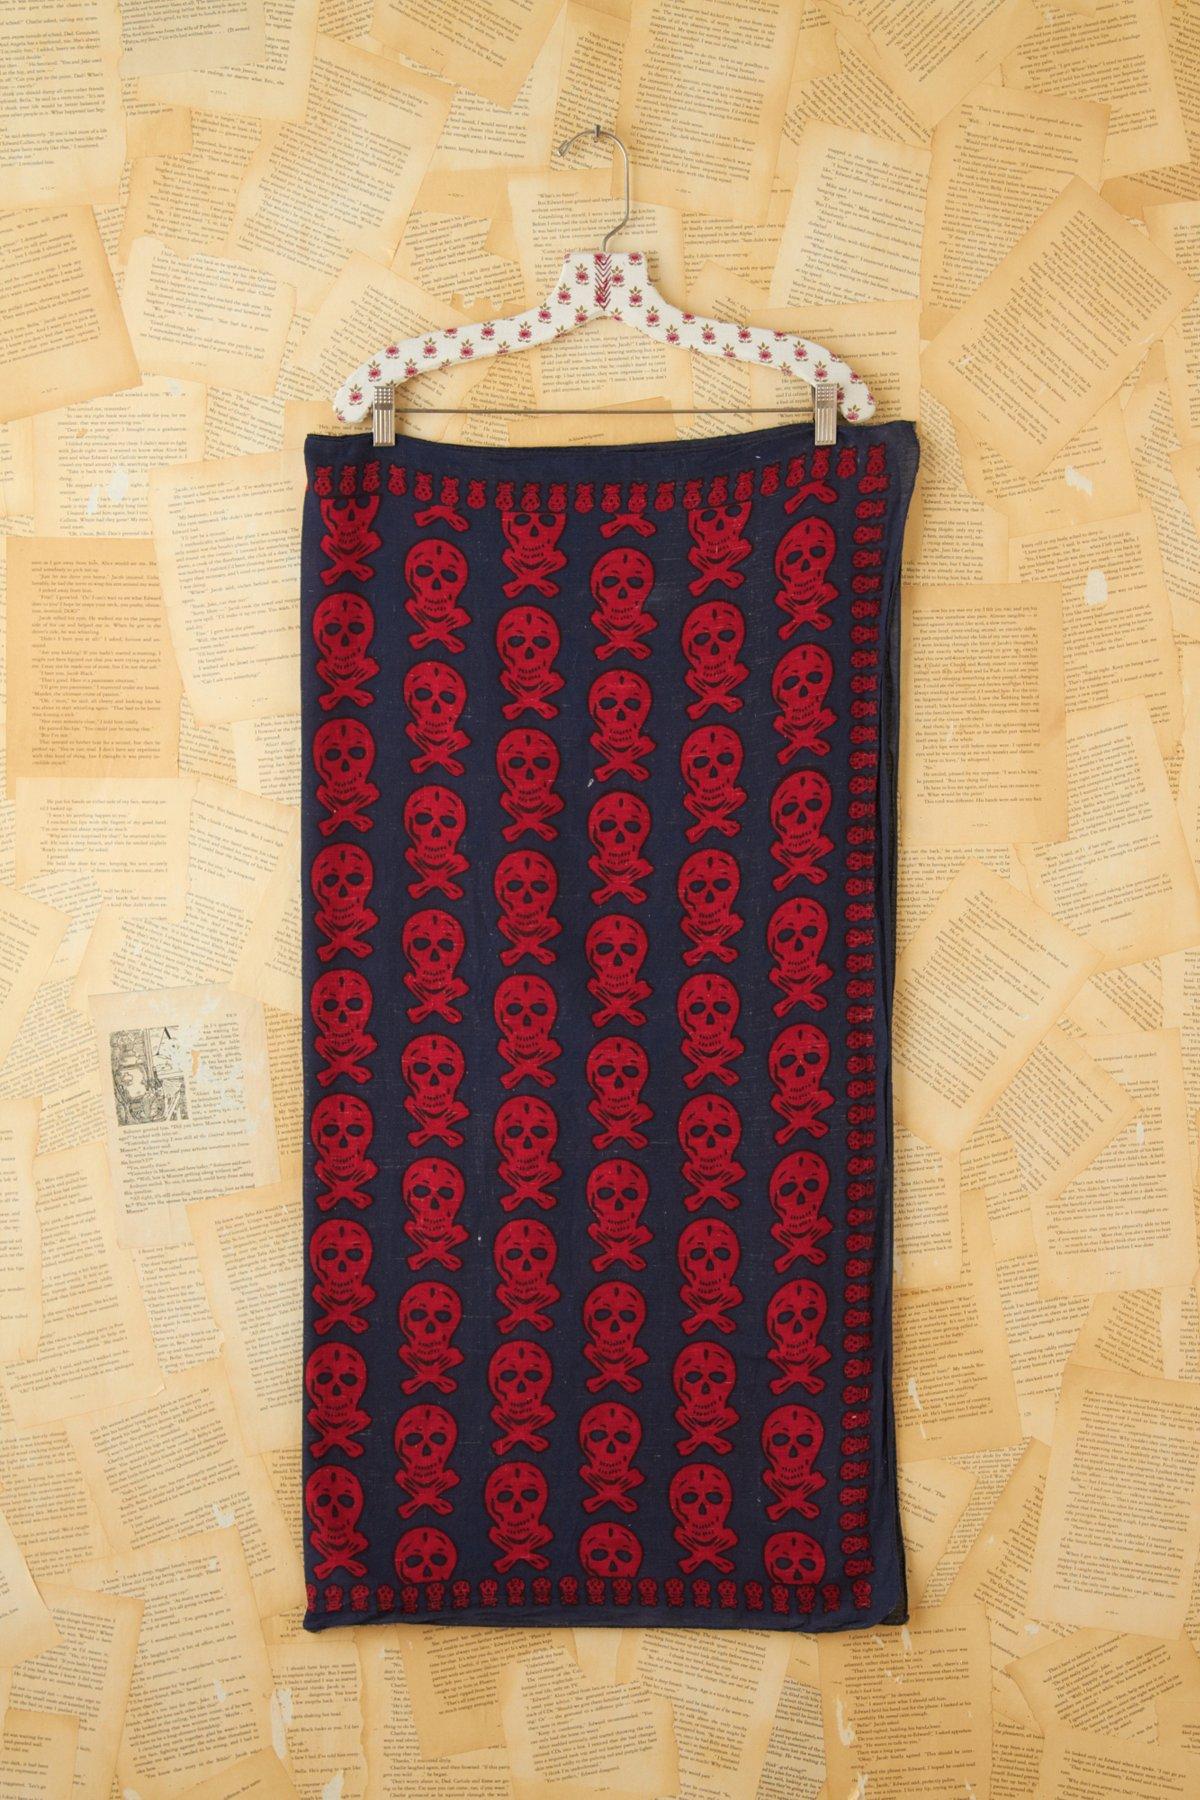 Vintage Blue and Red Skull Printed Scarf